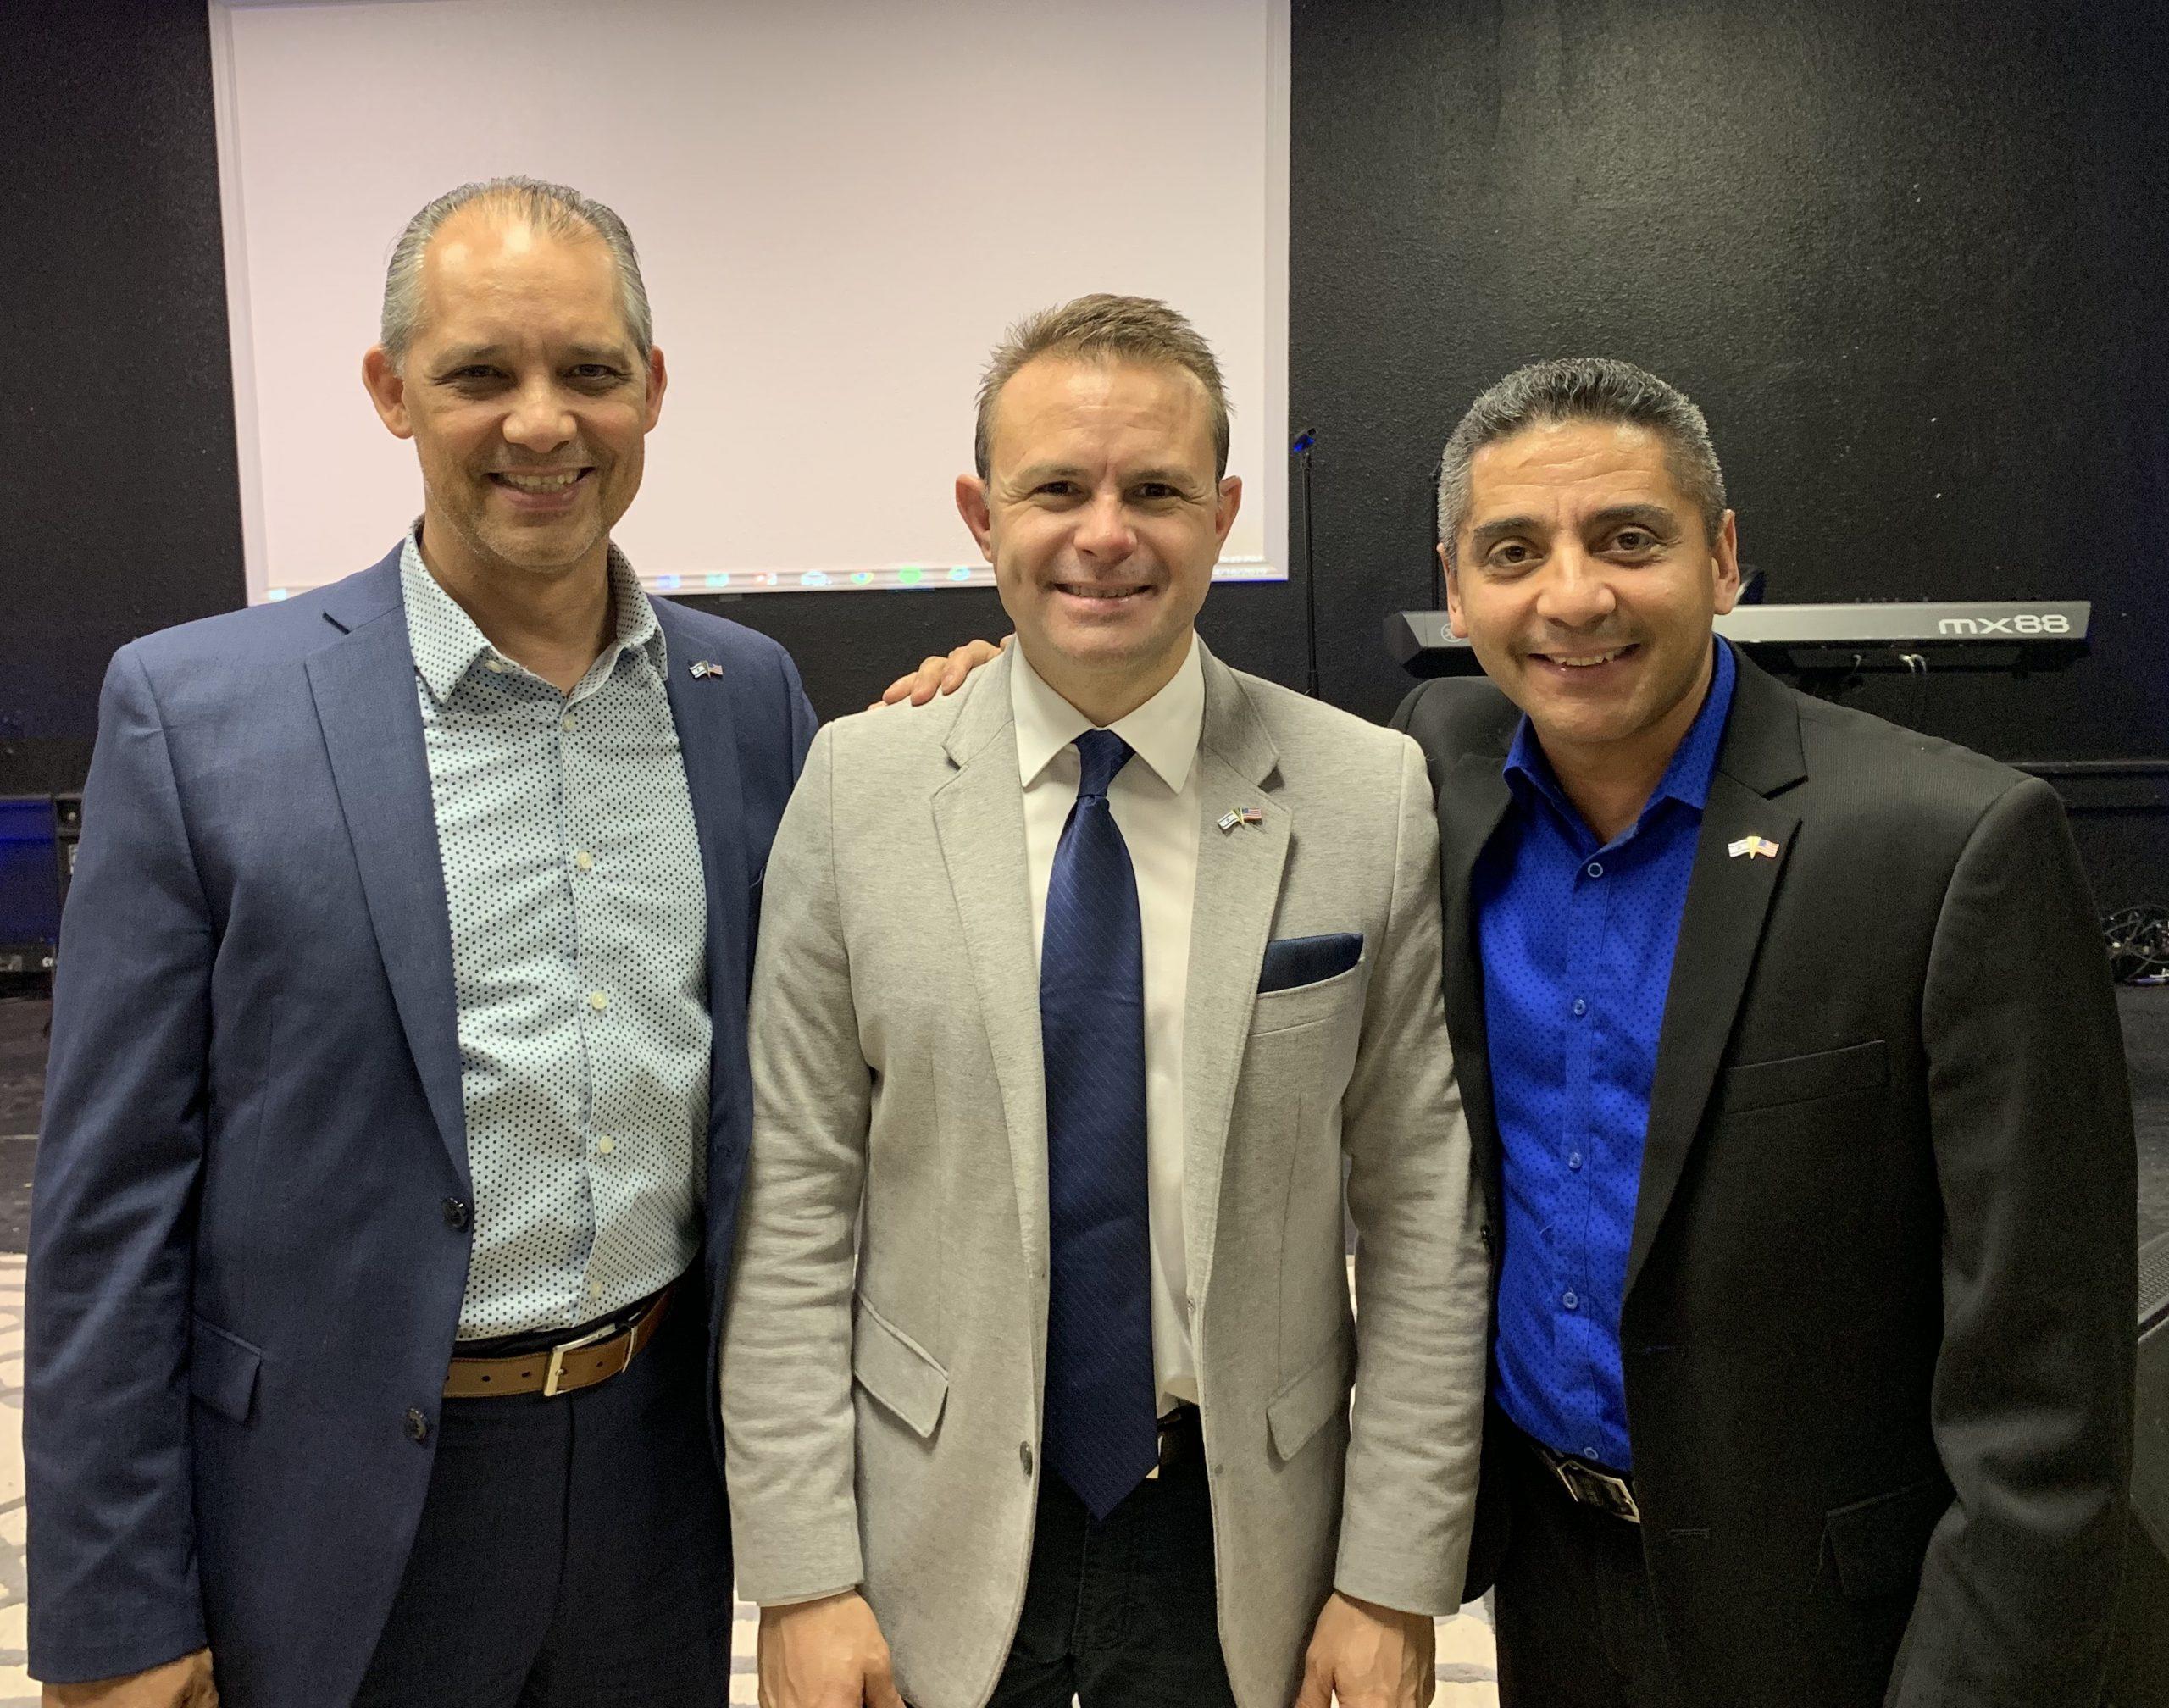 April 16 - Garland, TX - Pastor's Meeting